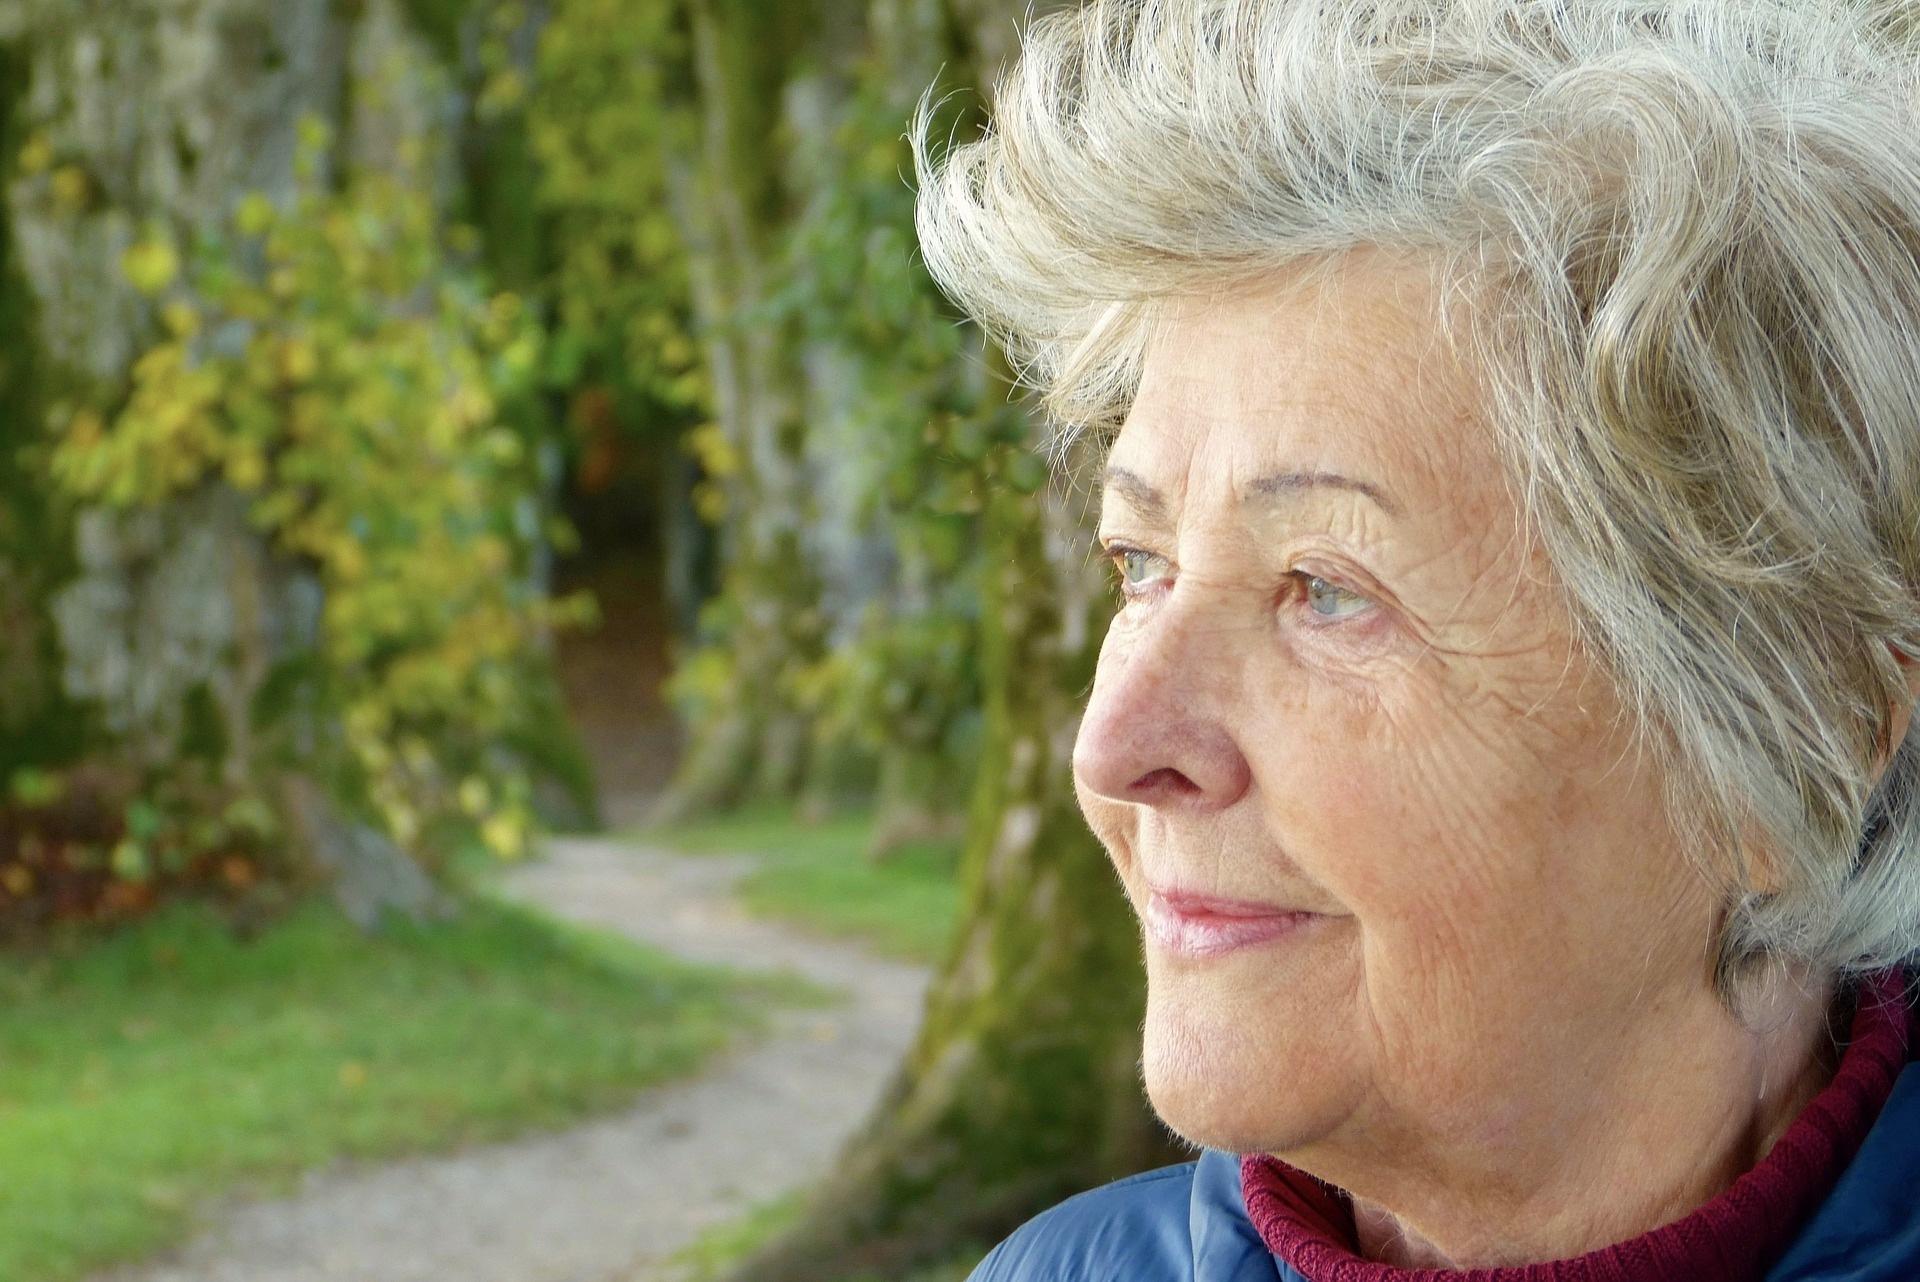 woman-3186741_1920_silviarita